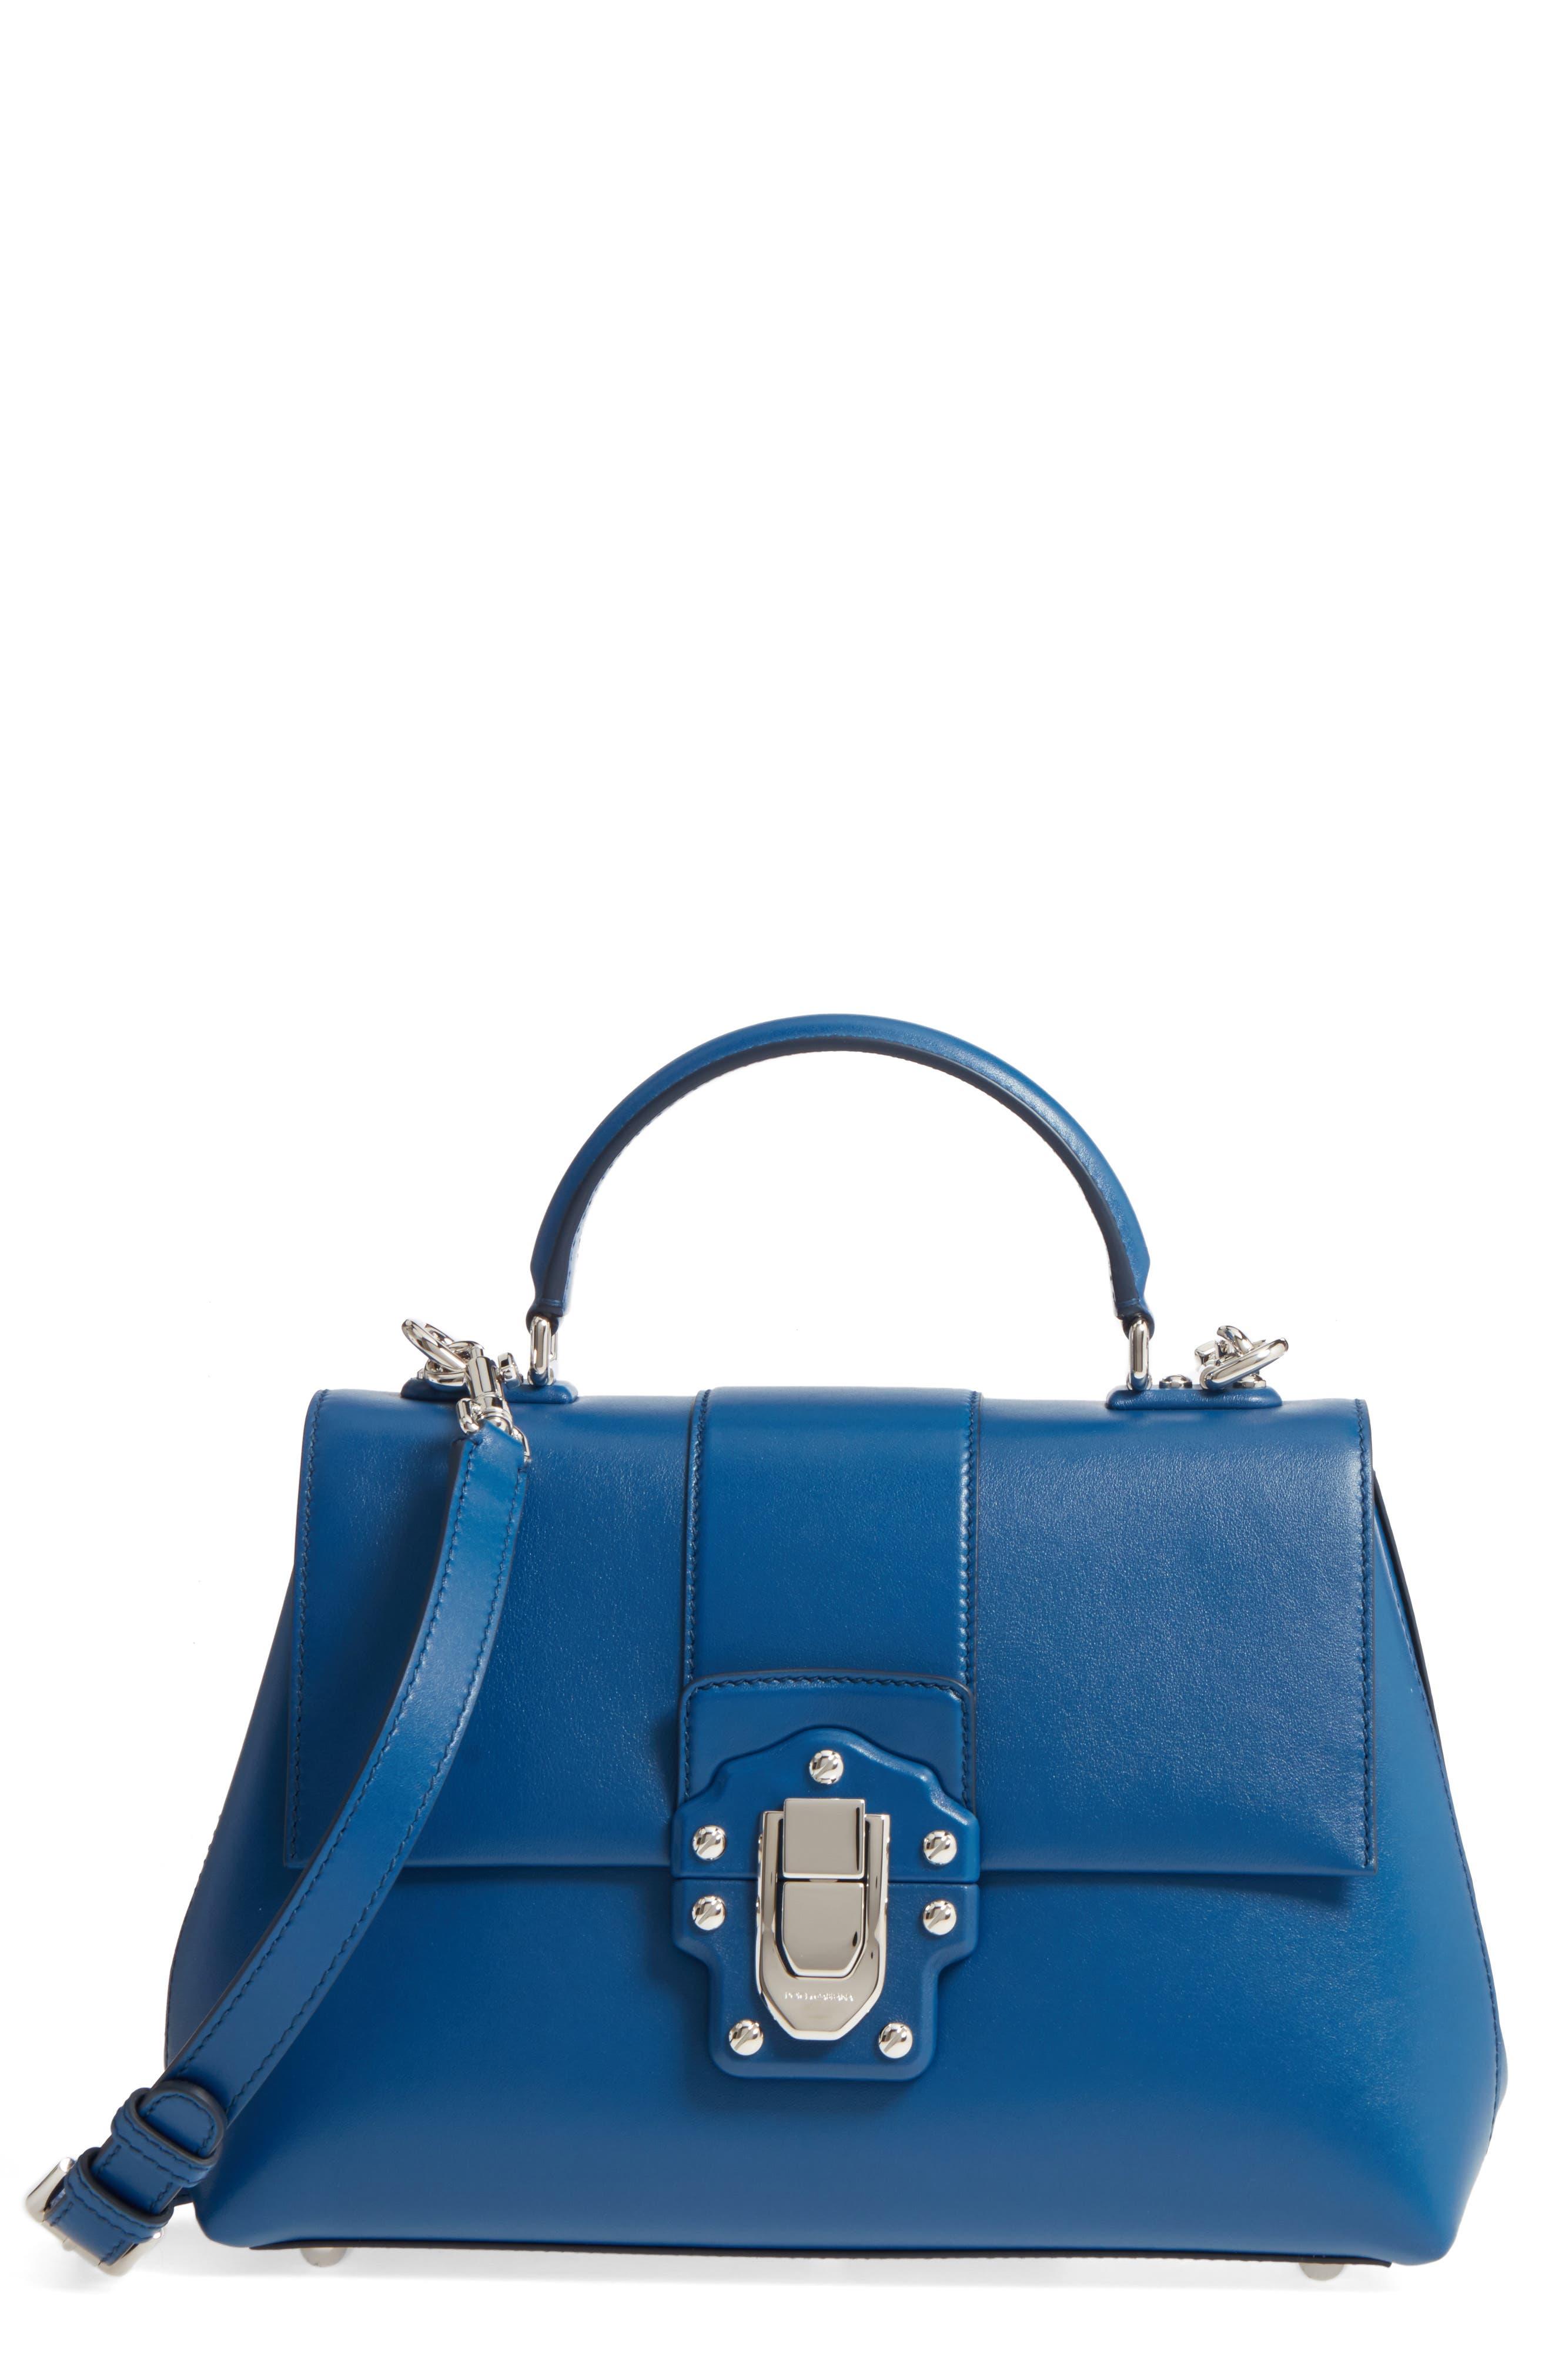 Medium Lucia Leather Satchel,                             Main thumbnail 1, color,                             Blue